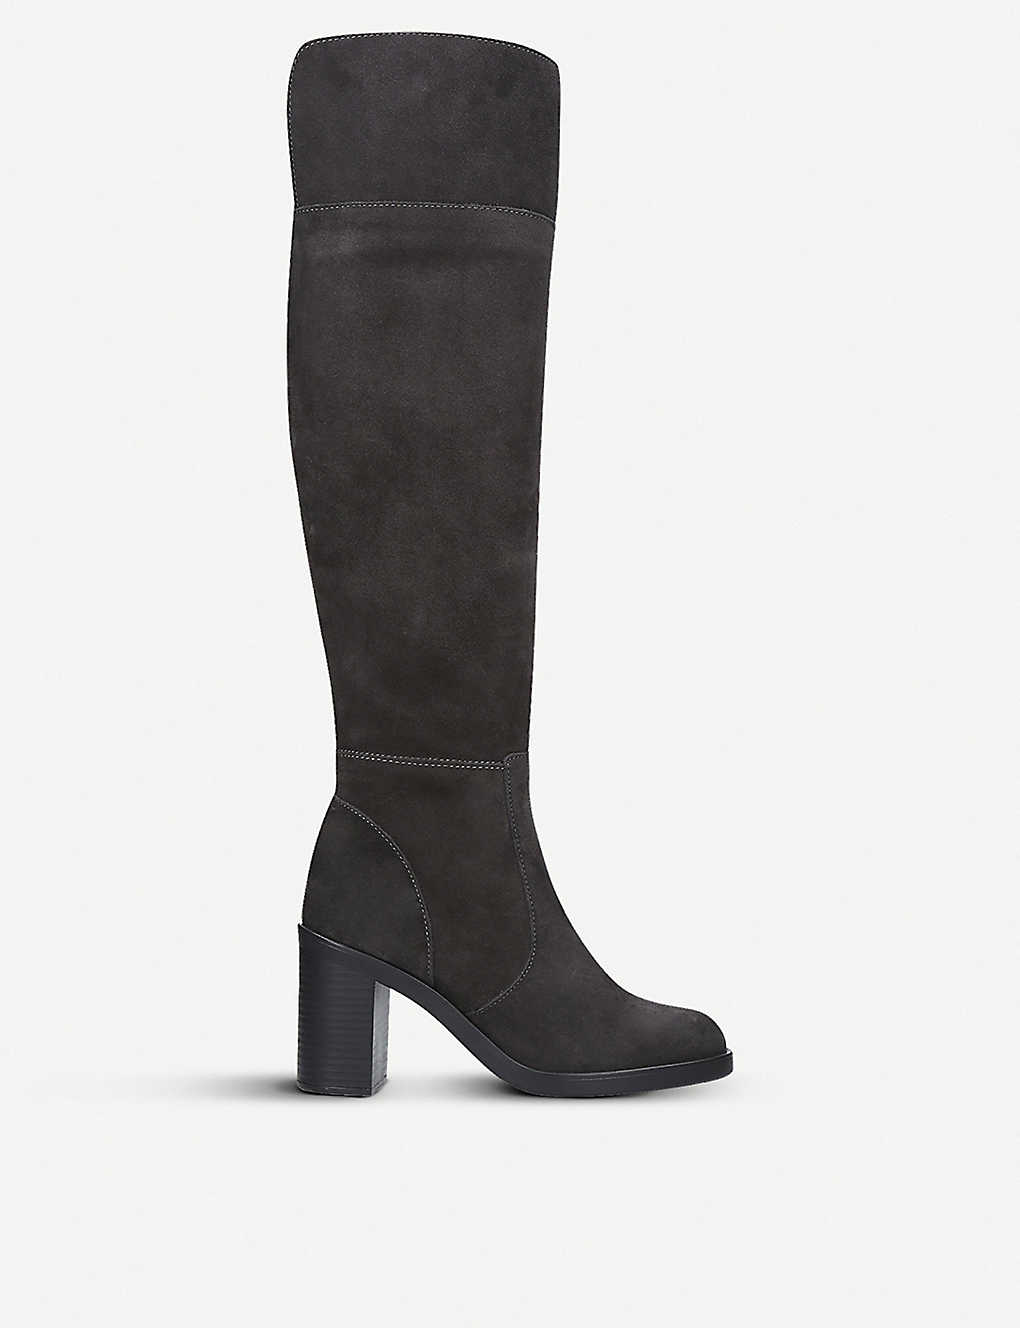 e71e4a55f93 KURT GEIGER LONDON - Tring suede over-the-knee boots